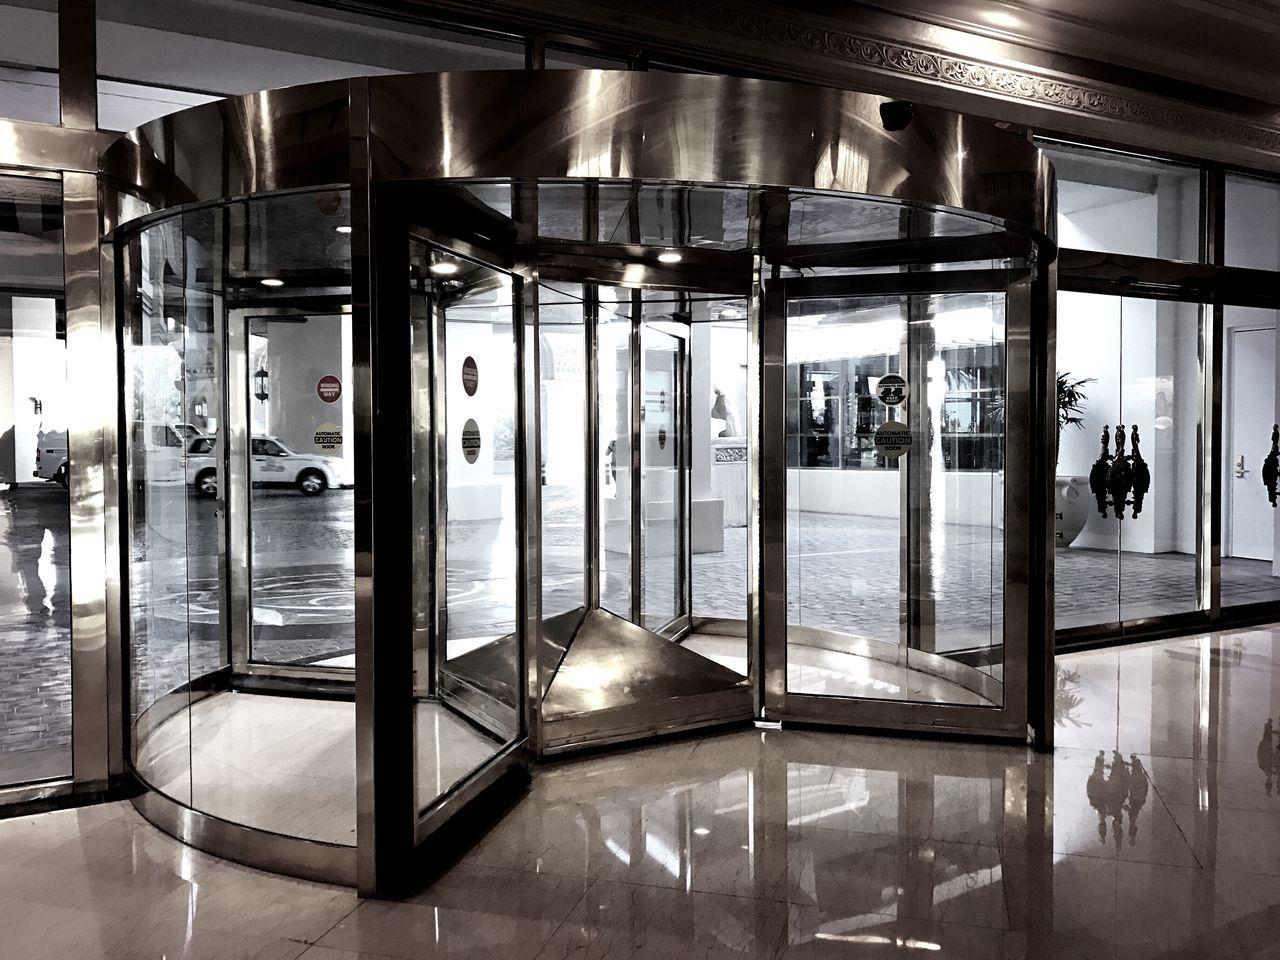 Built Structure Modern Architecture Luxury Indoors  No People Illuminated Sliding Door Day